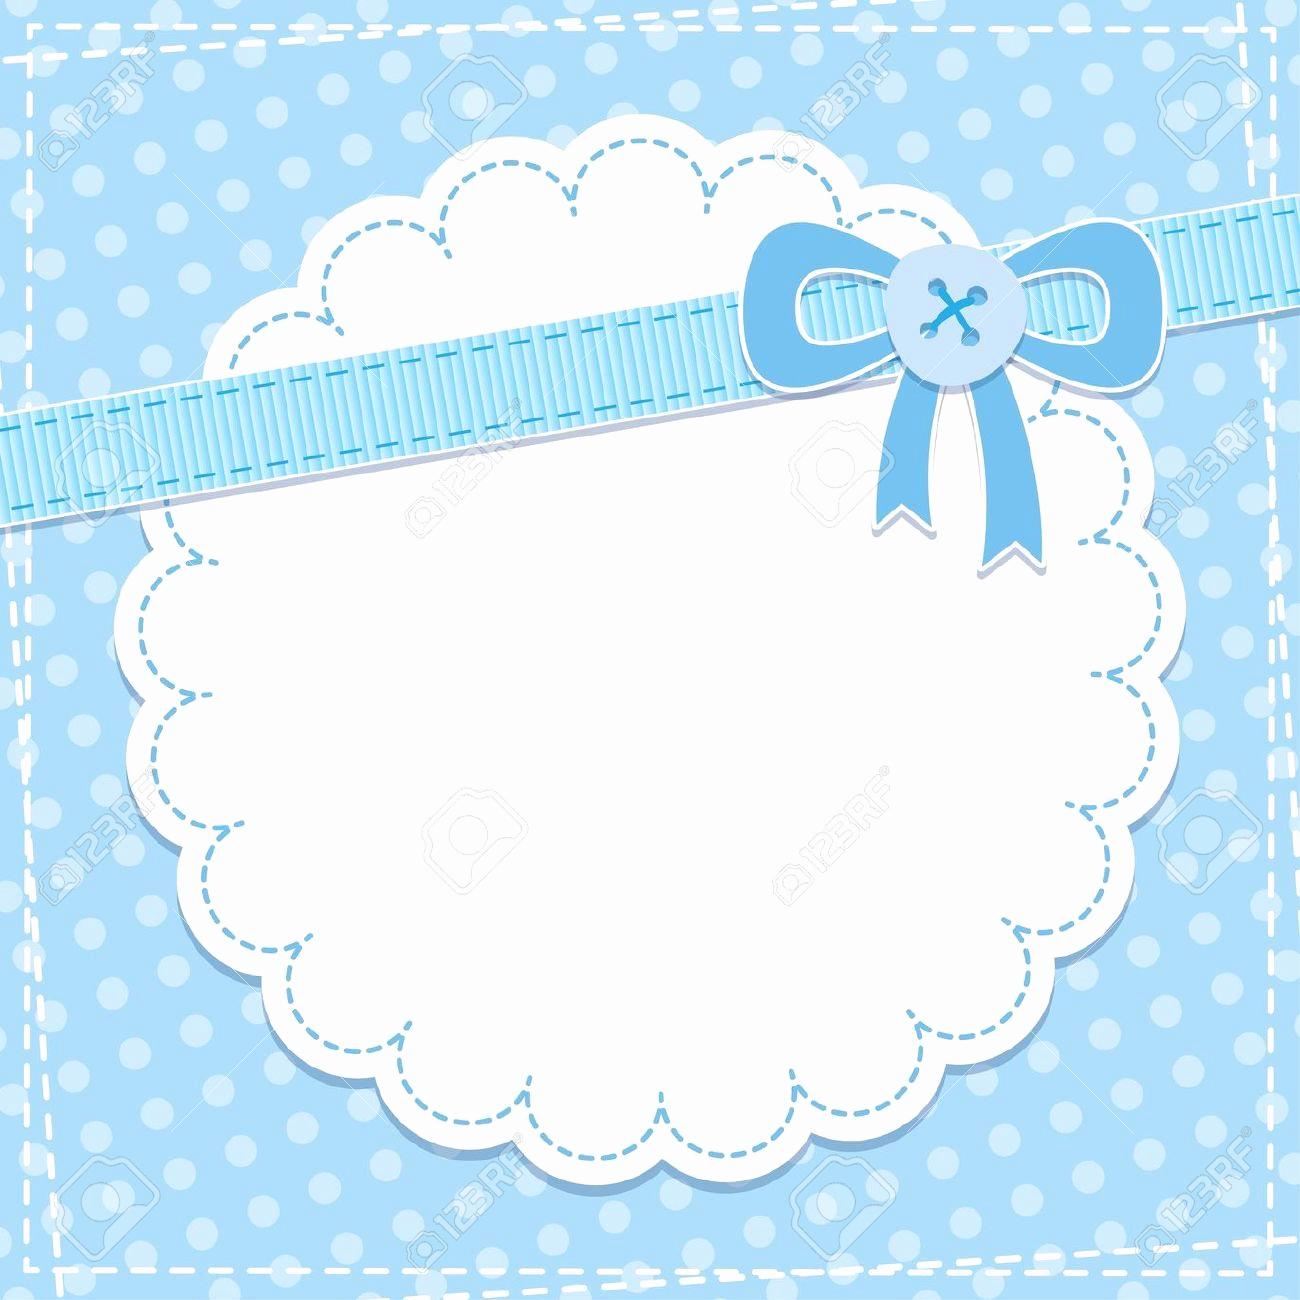 Baby Shower Invitation Borders New Baby Shower Invitation Stock Royalty